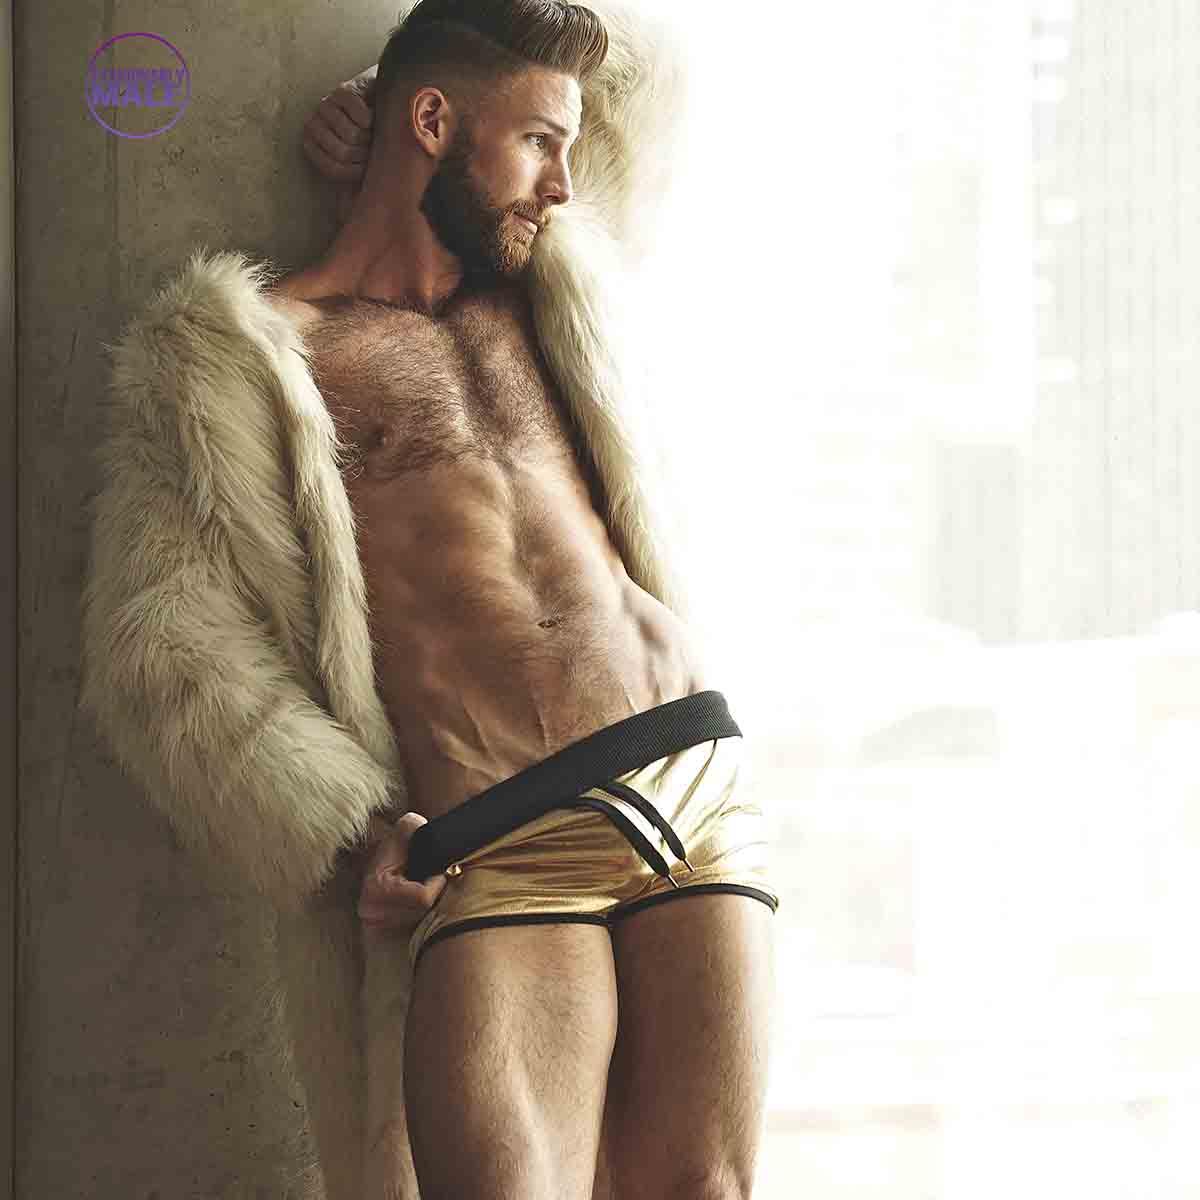 Brock Williams by KJ Heath for Fashionably Male3